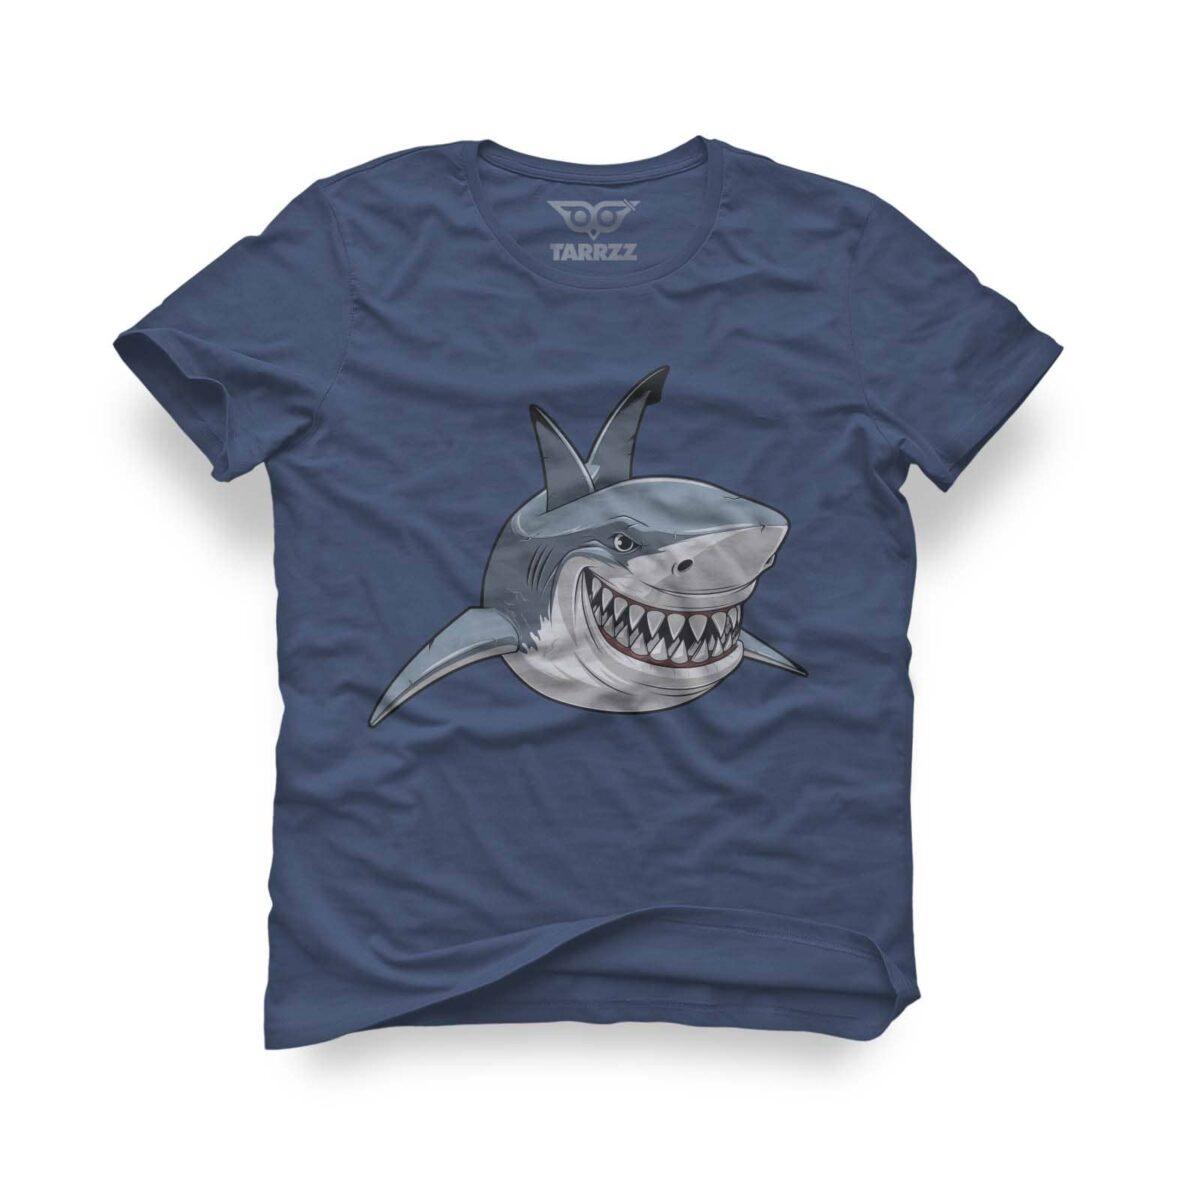 tarrzz-tasarim-indigo-mavi-tisort-smile-like-a-shark